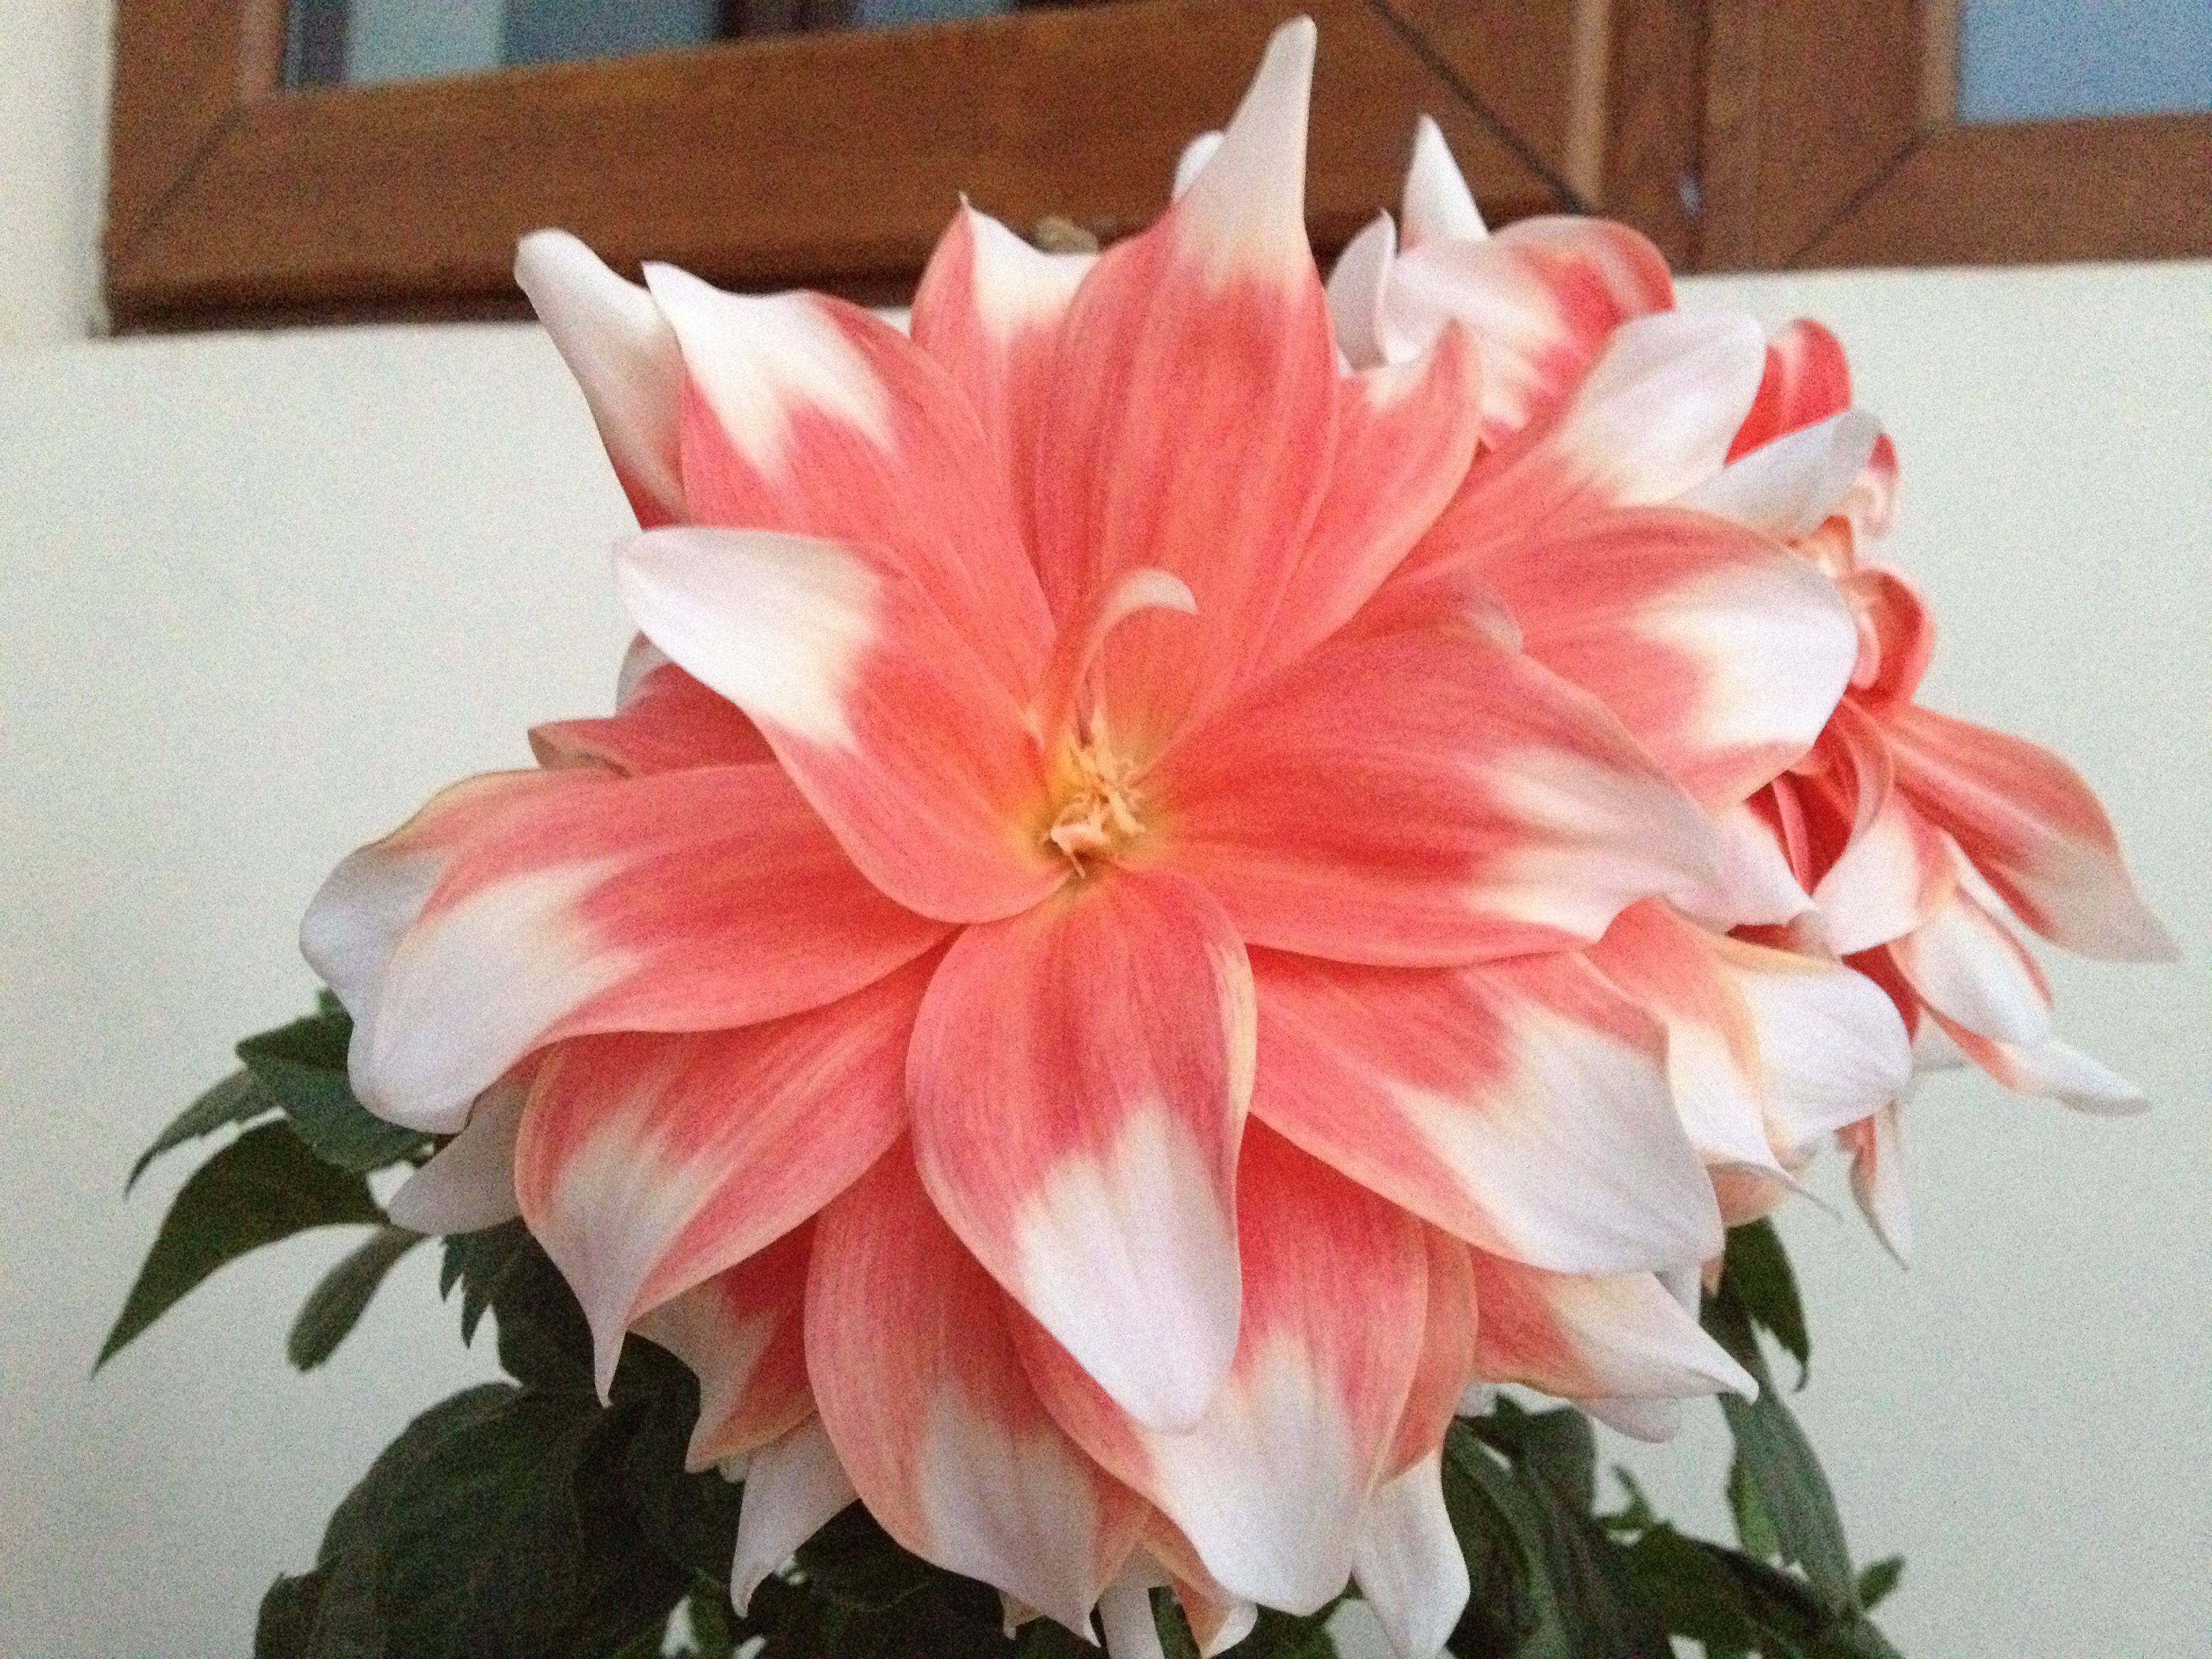 Dahlia from gurgaon flower garden my flower flowers